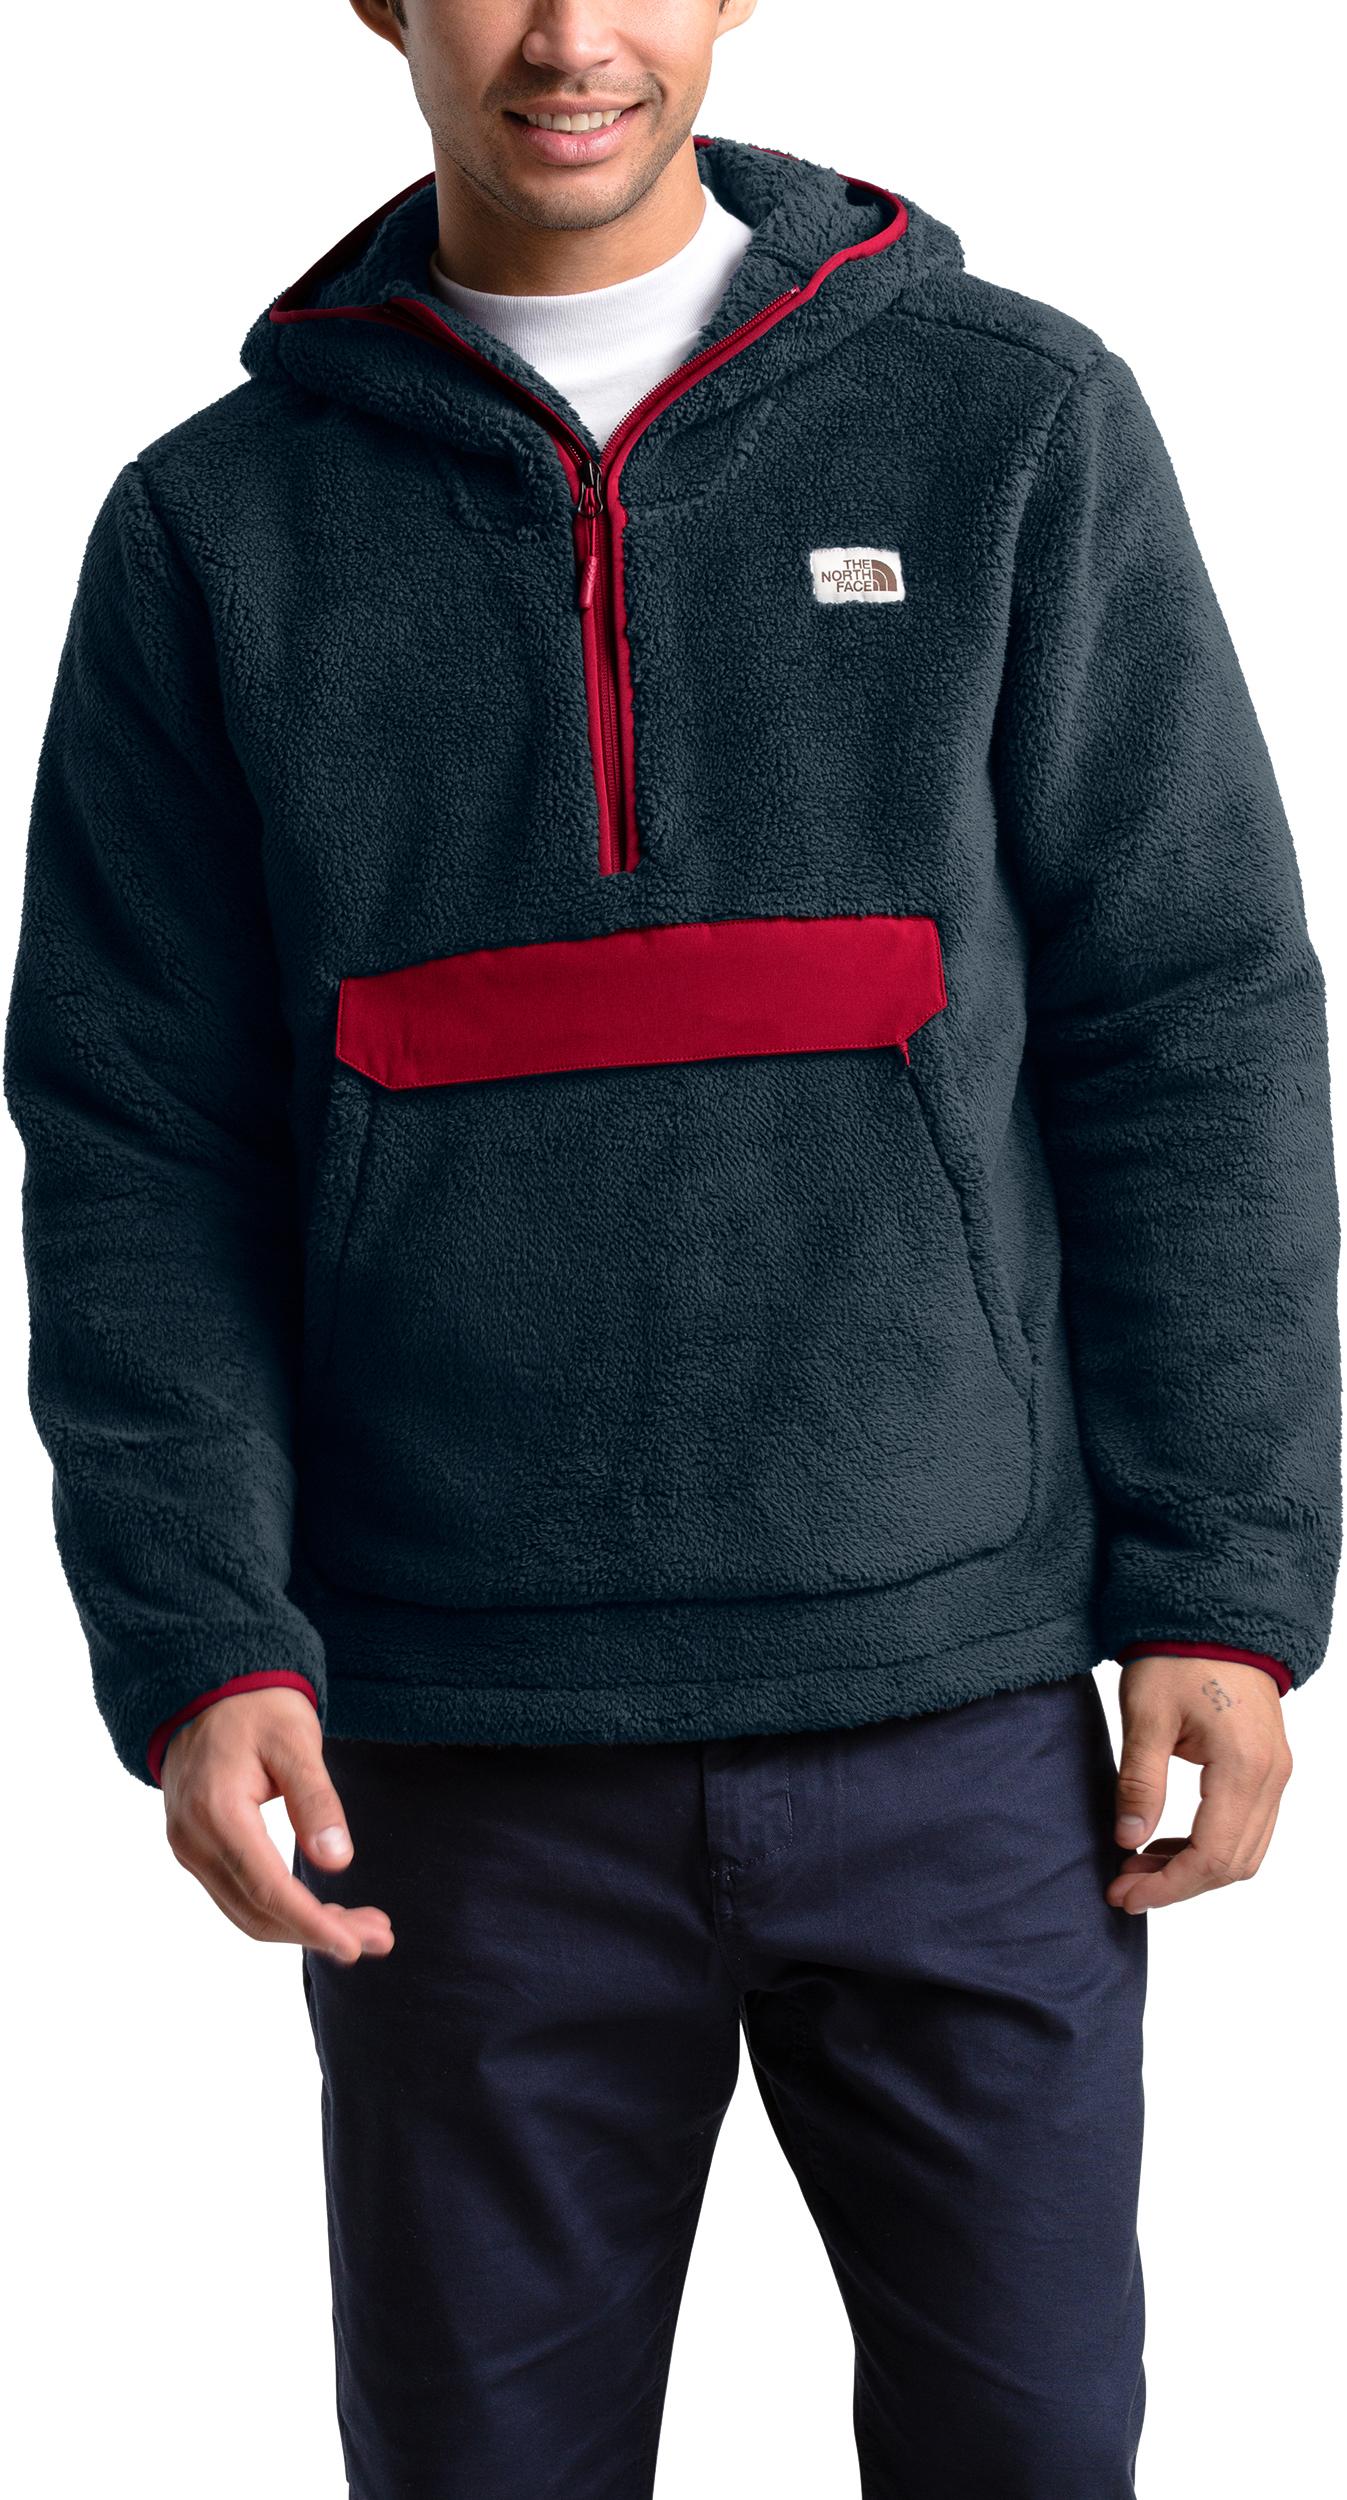 wholesale dealer 5fd5c 94dcd Fleece jackets | MEC